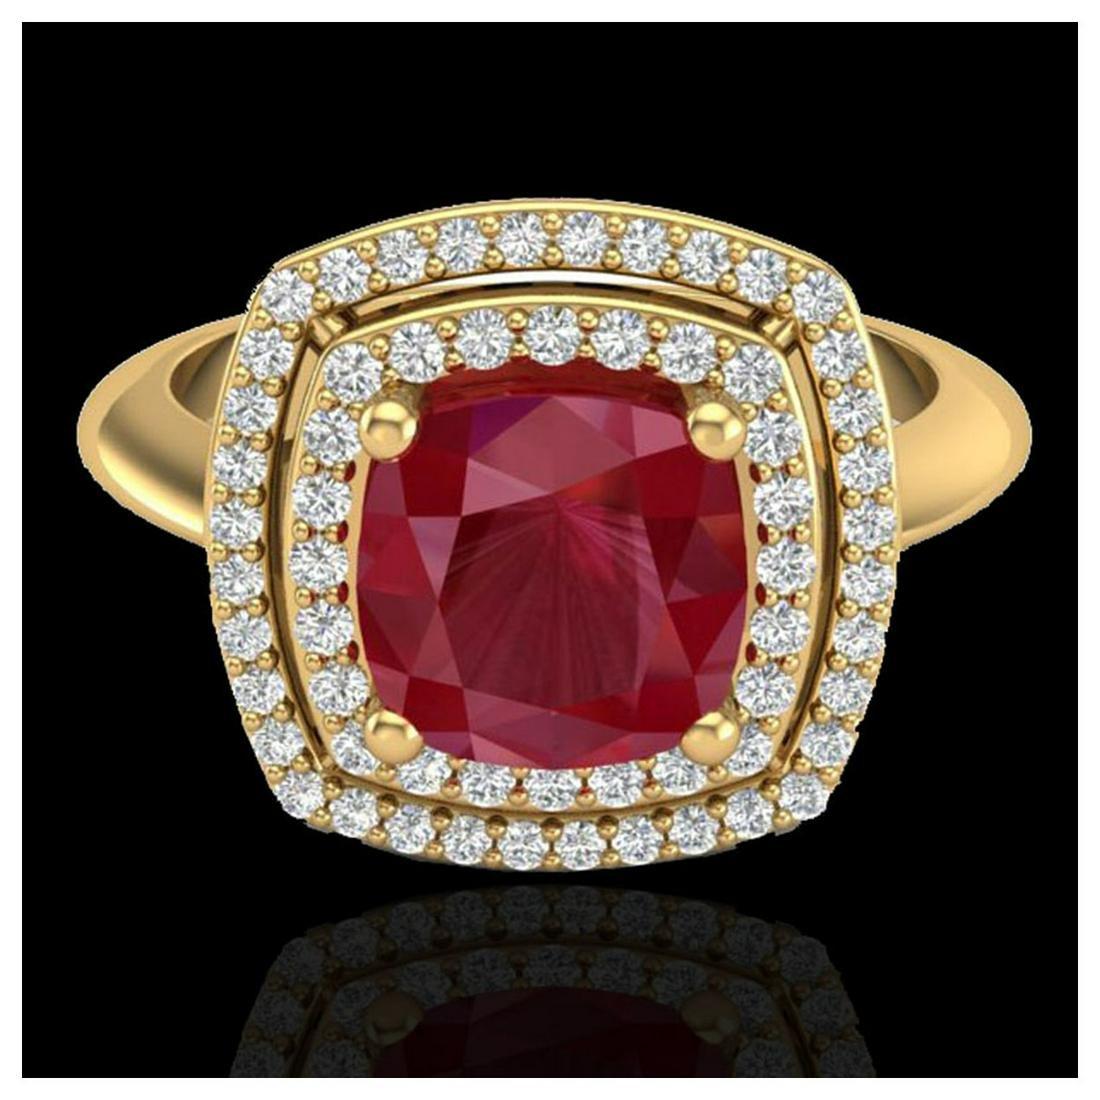 2.52 ctw Ruby & VS/SI Diamond Ring 18K Yellow Gold -